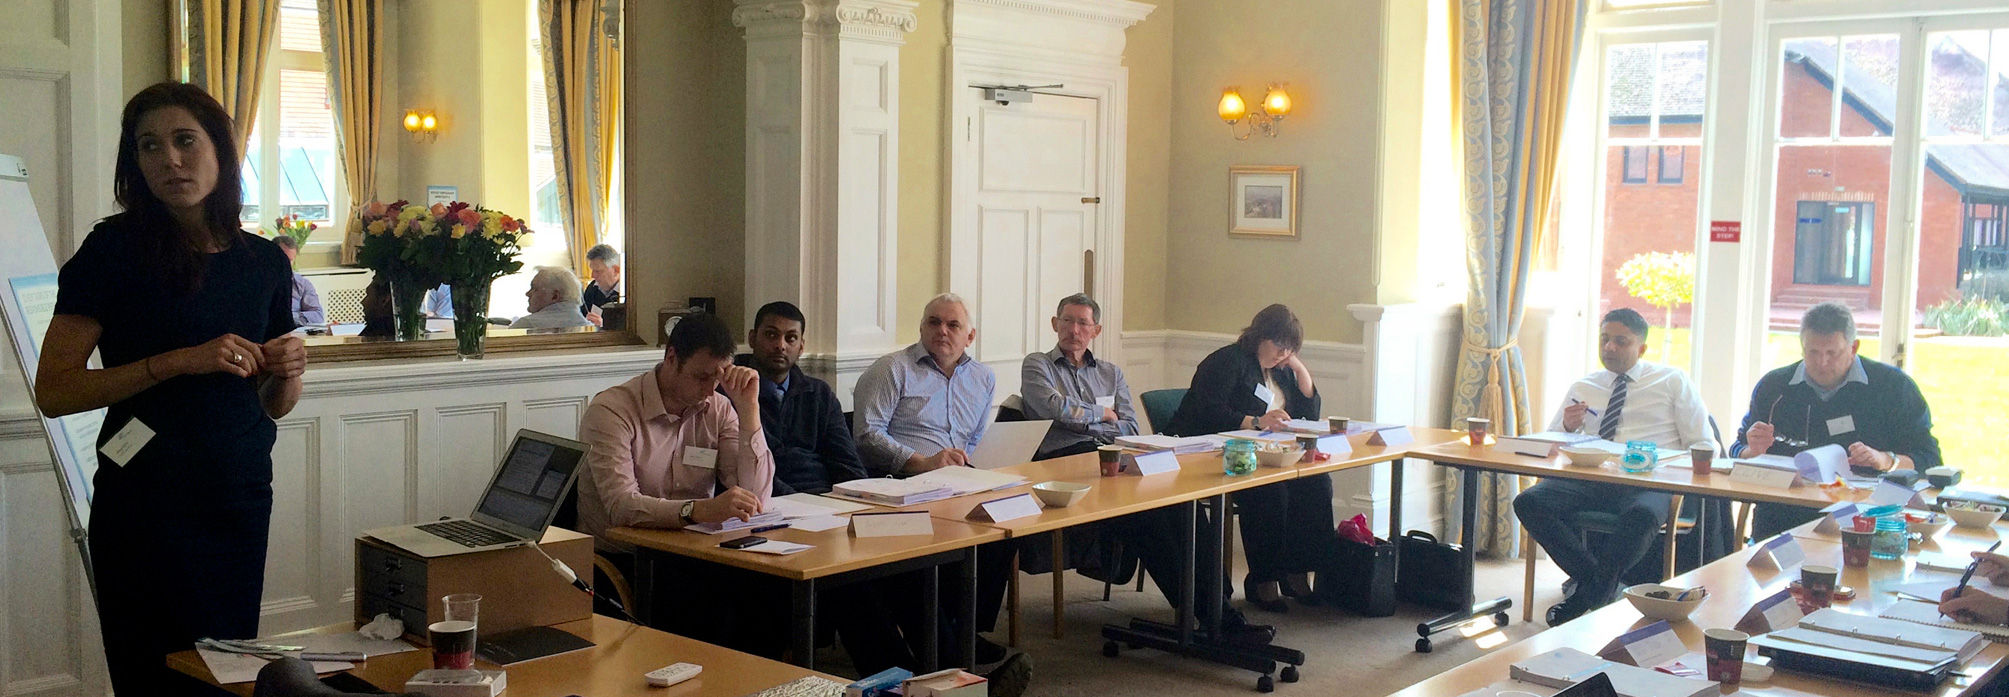 PMN Consulting Training Reka Tutoring